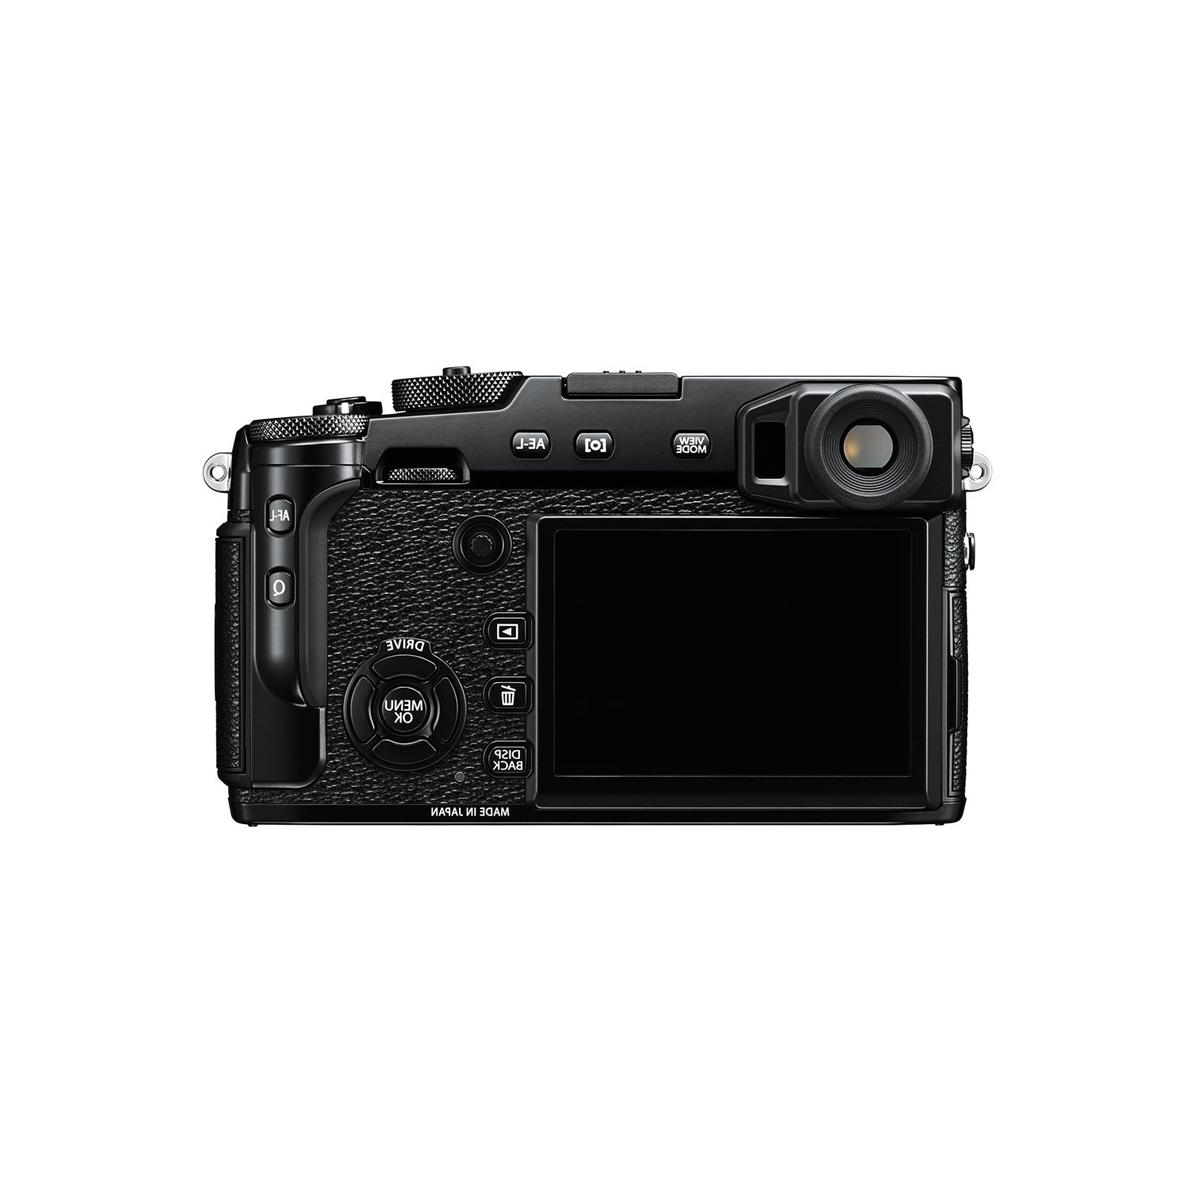 Fujifilm X-Pro2 Mirrorless Body